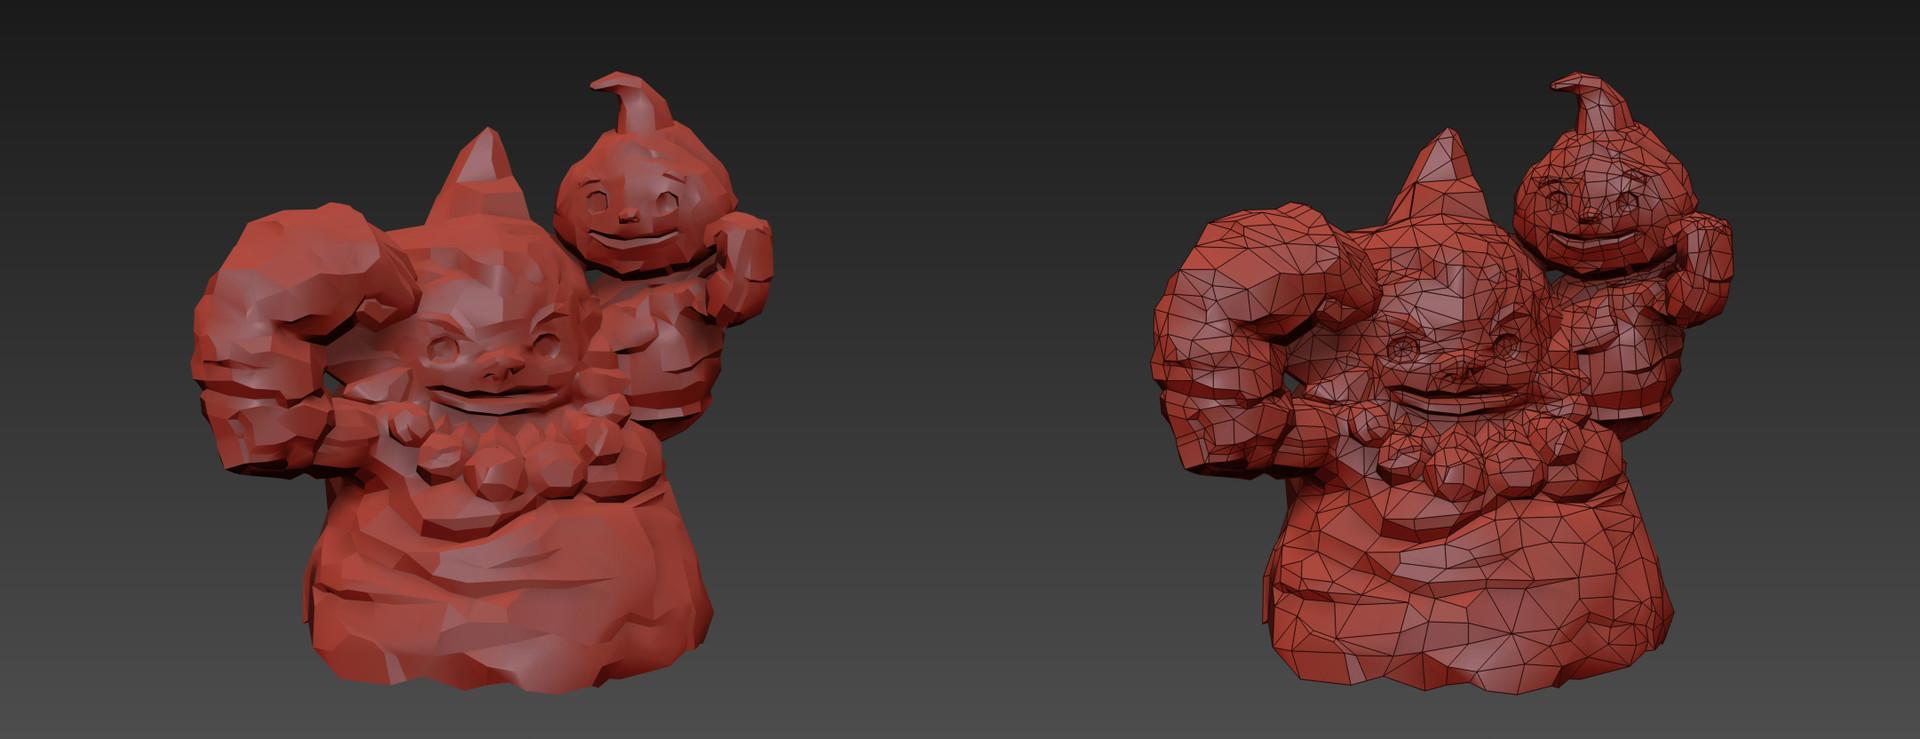 Goron Statue B - 3DS Max screengrab